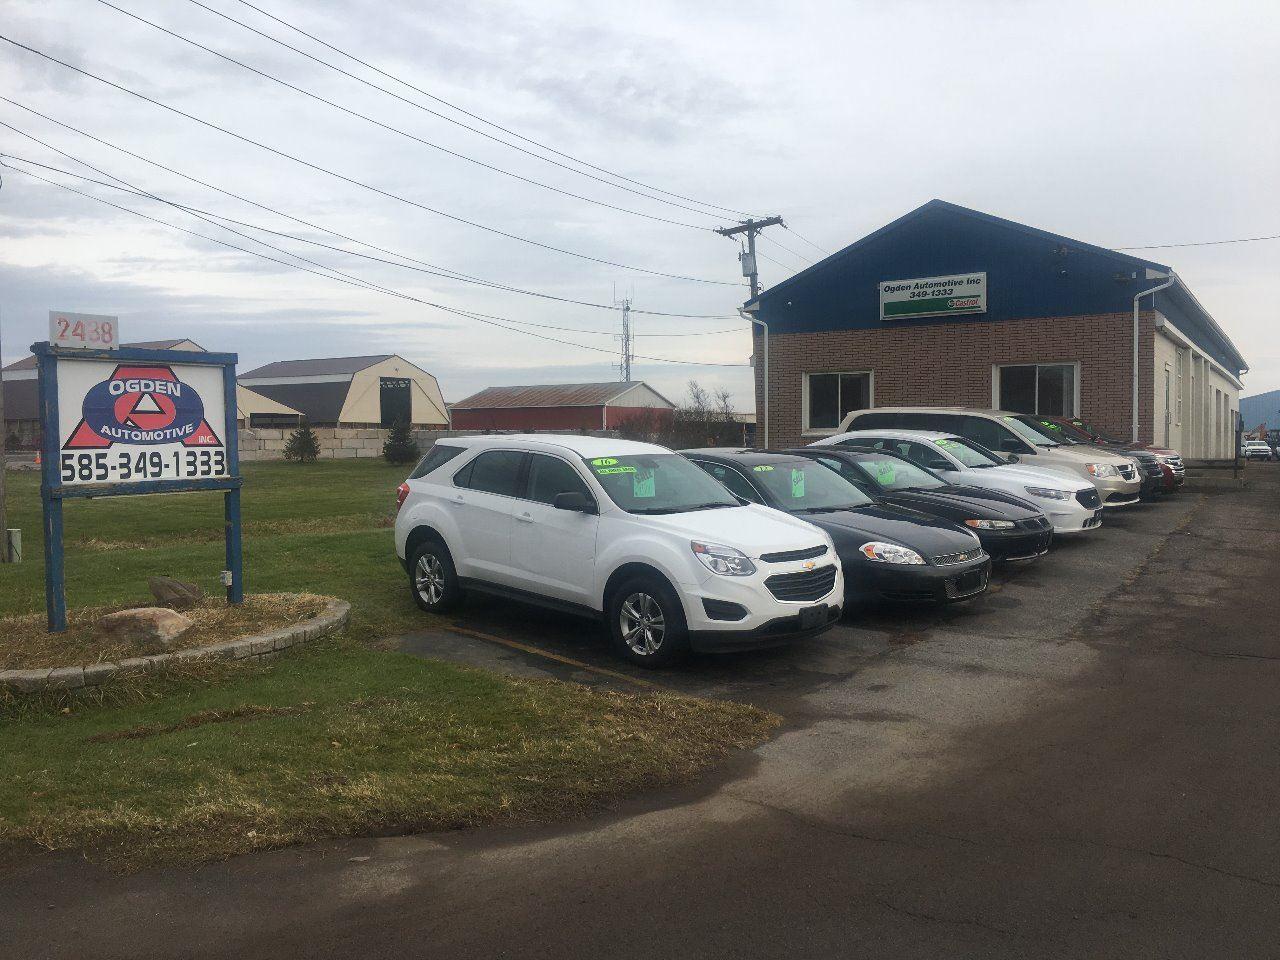 Ogden Auto Sales LLC